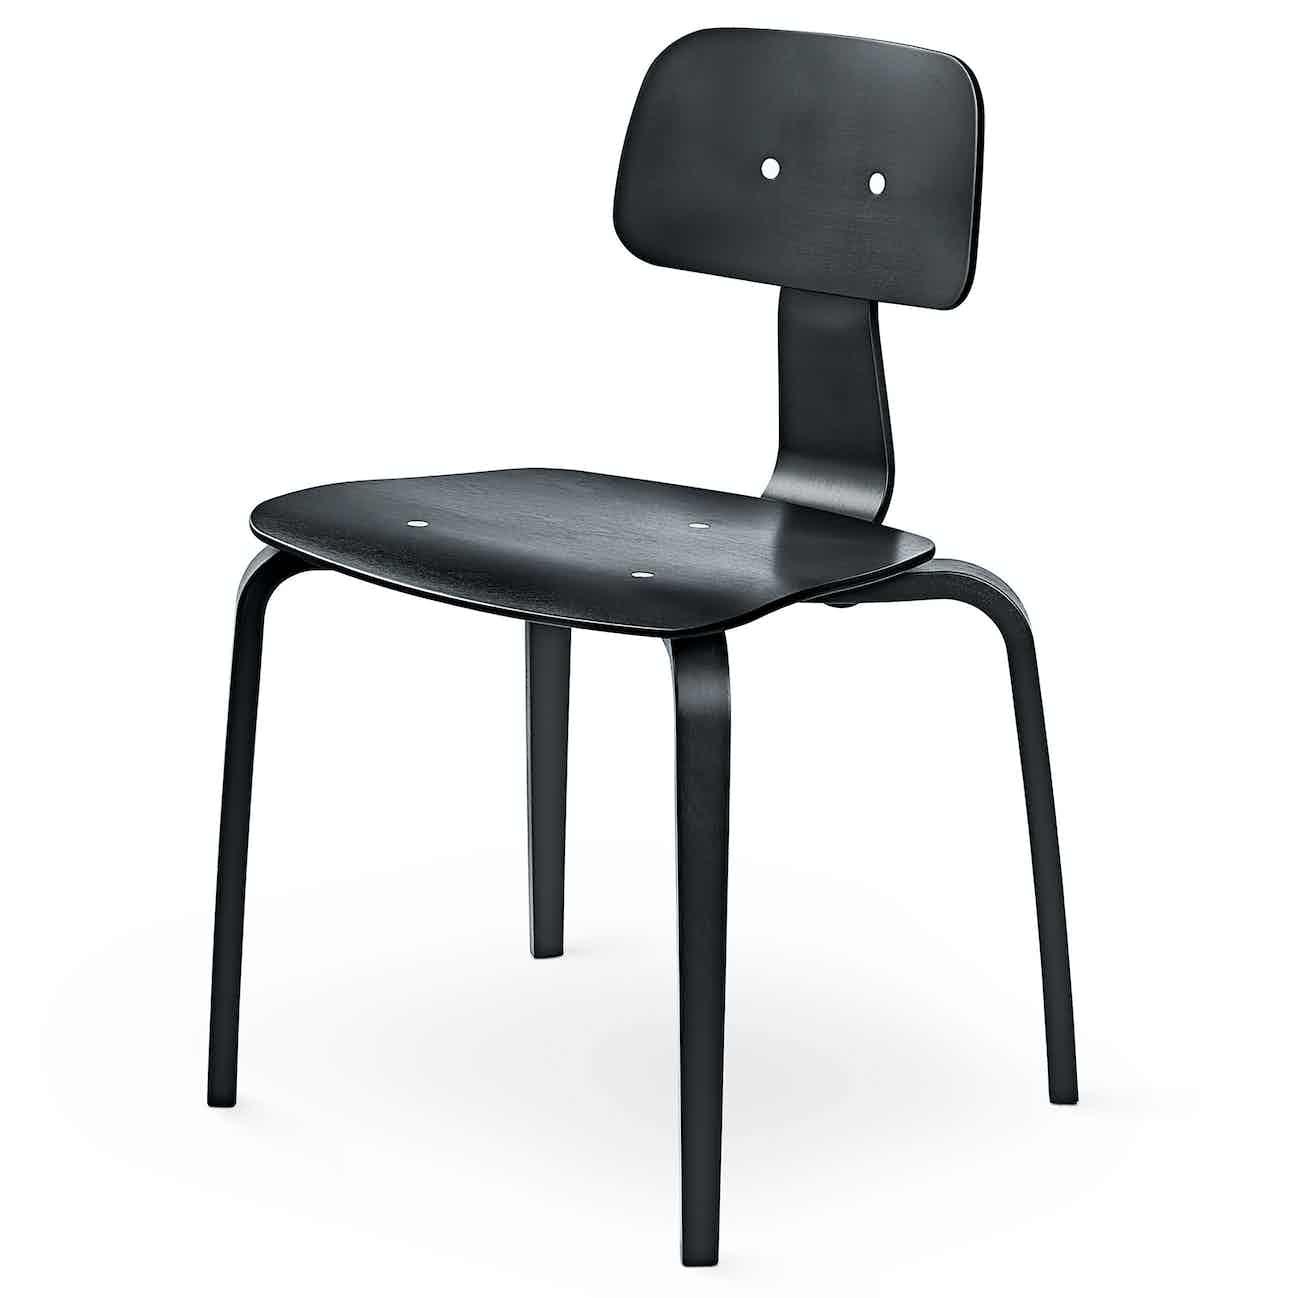 Engelbrechts kevi 2070 chair black angle haute living